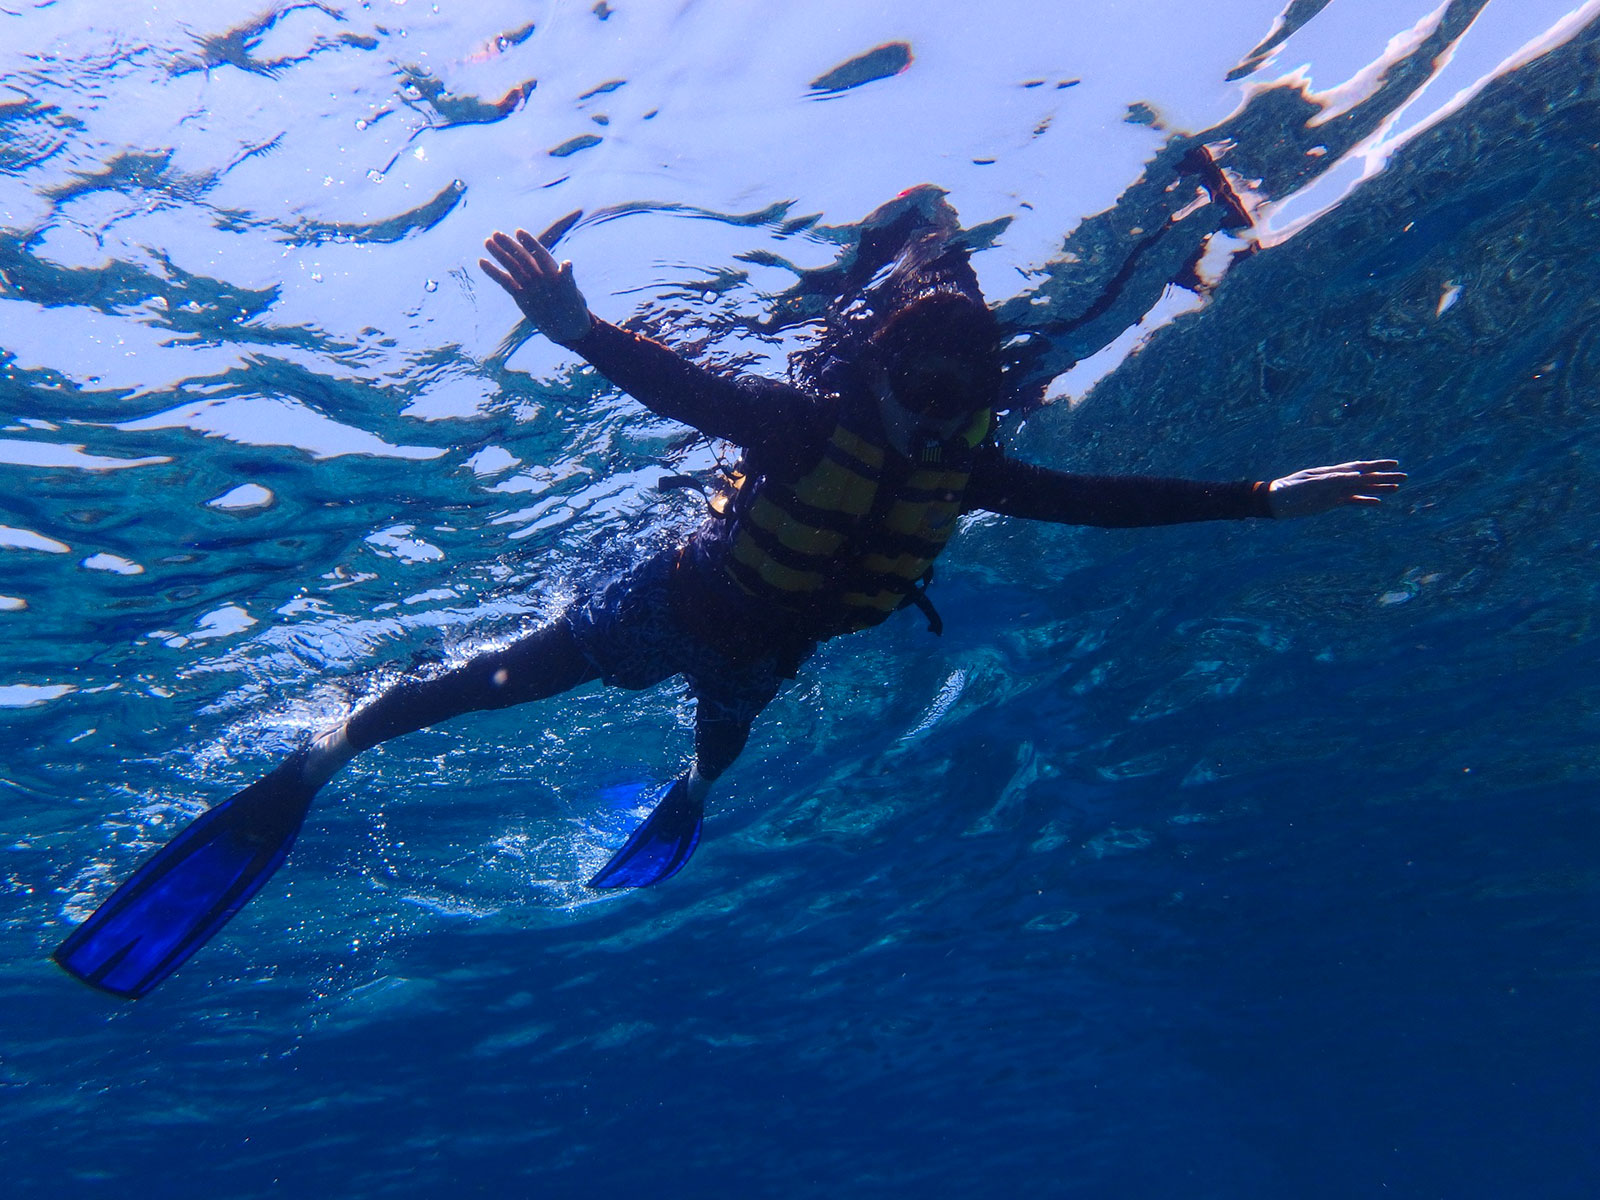 baliclub-snorkeling-lifejacket